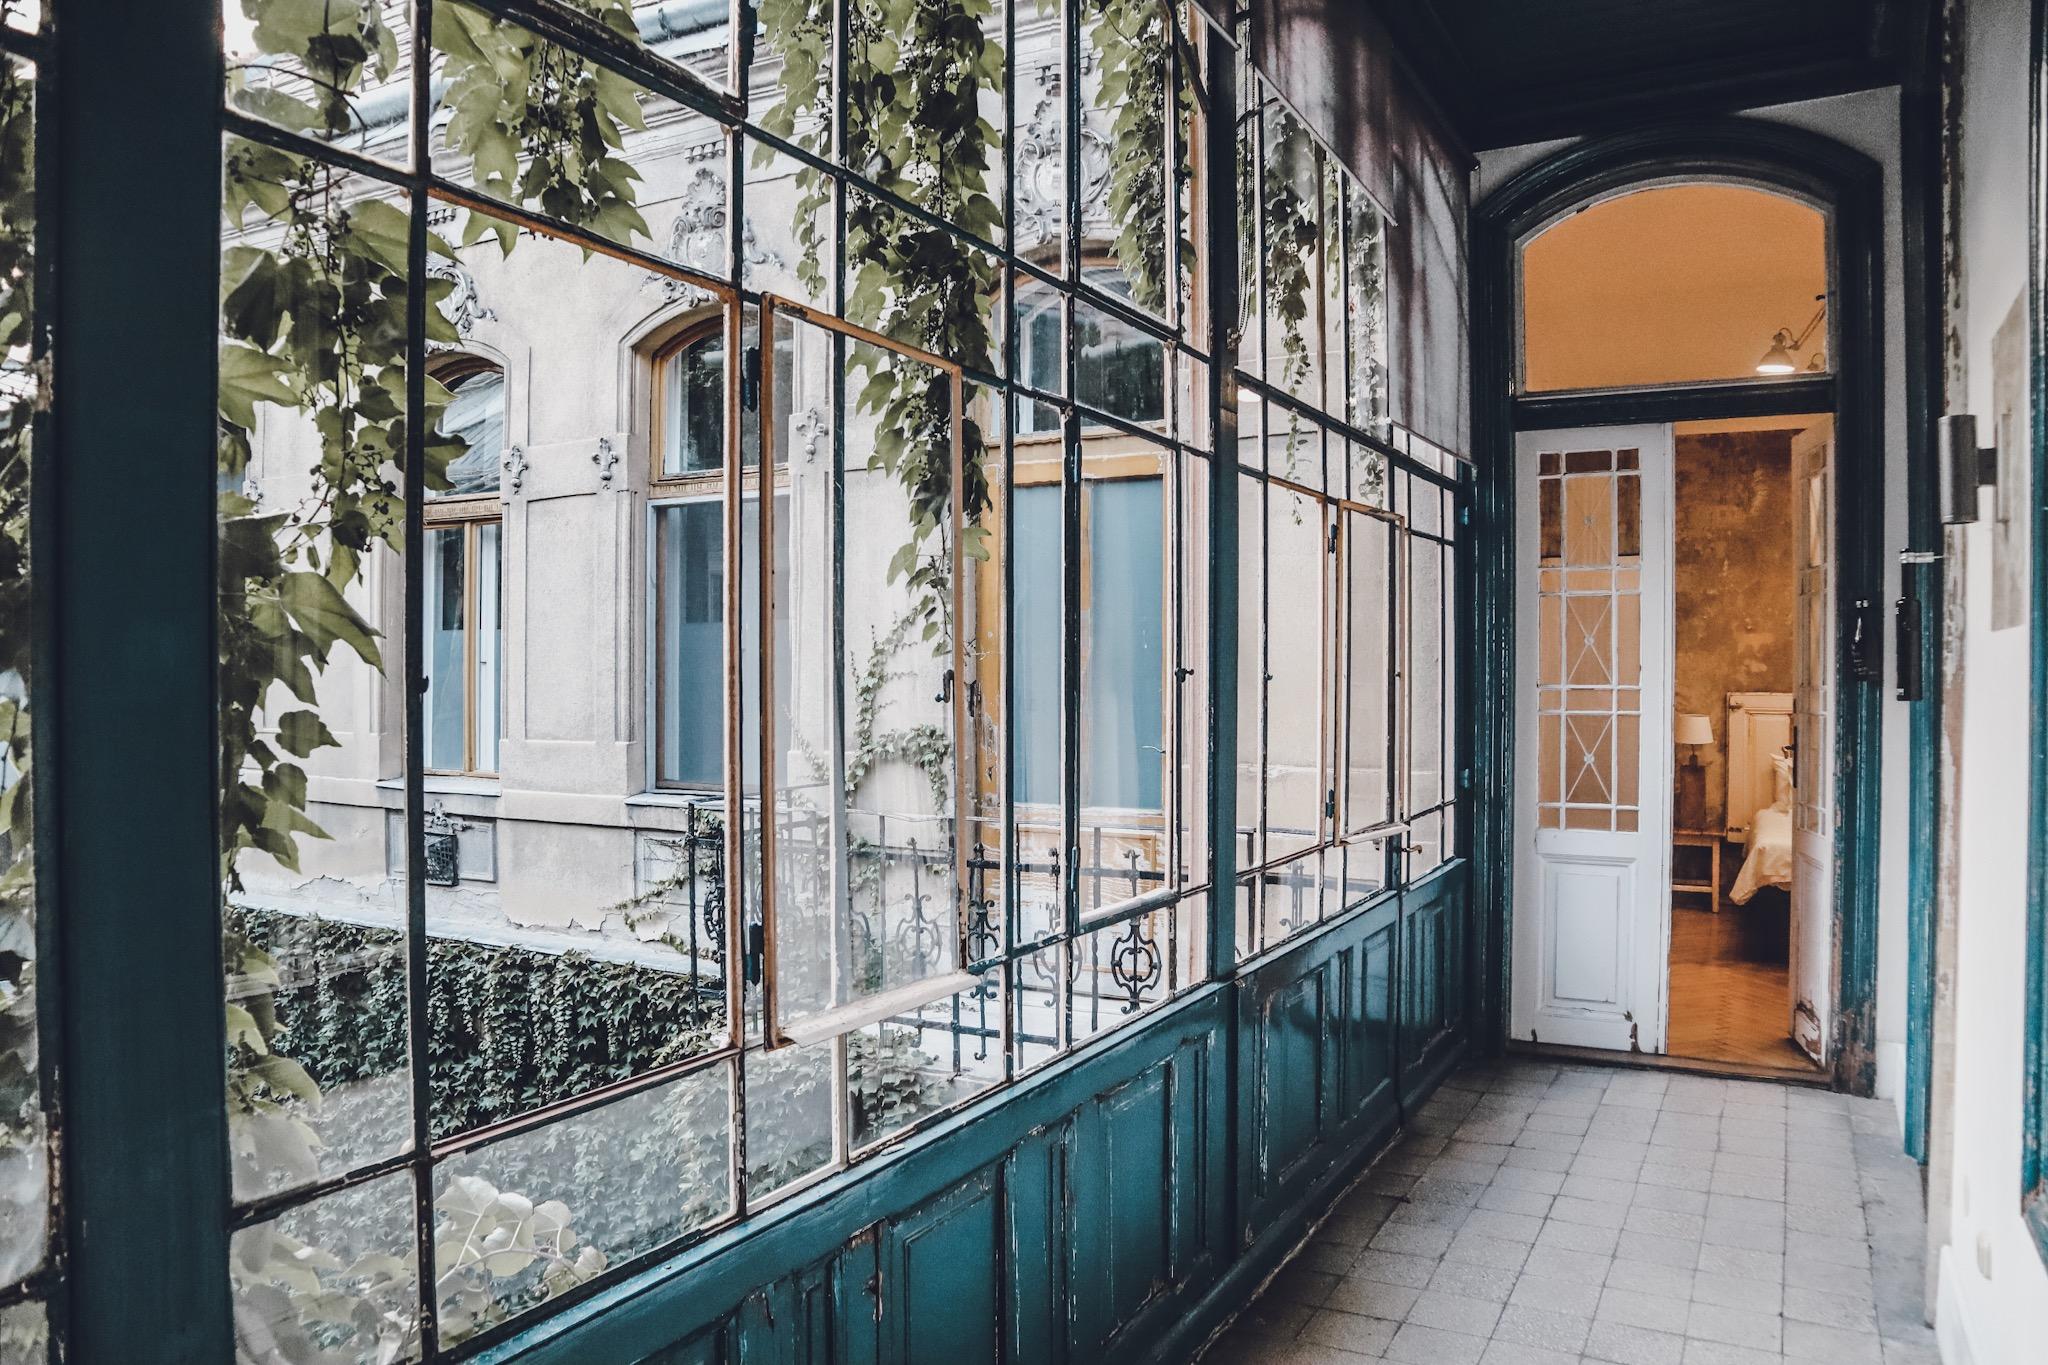 Budapest dove dormire